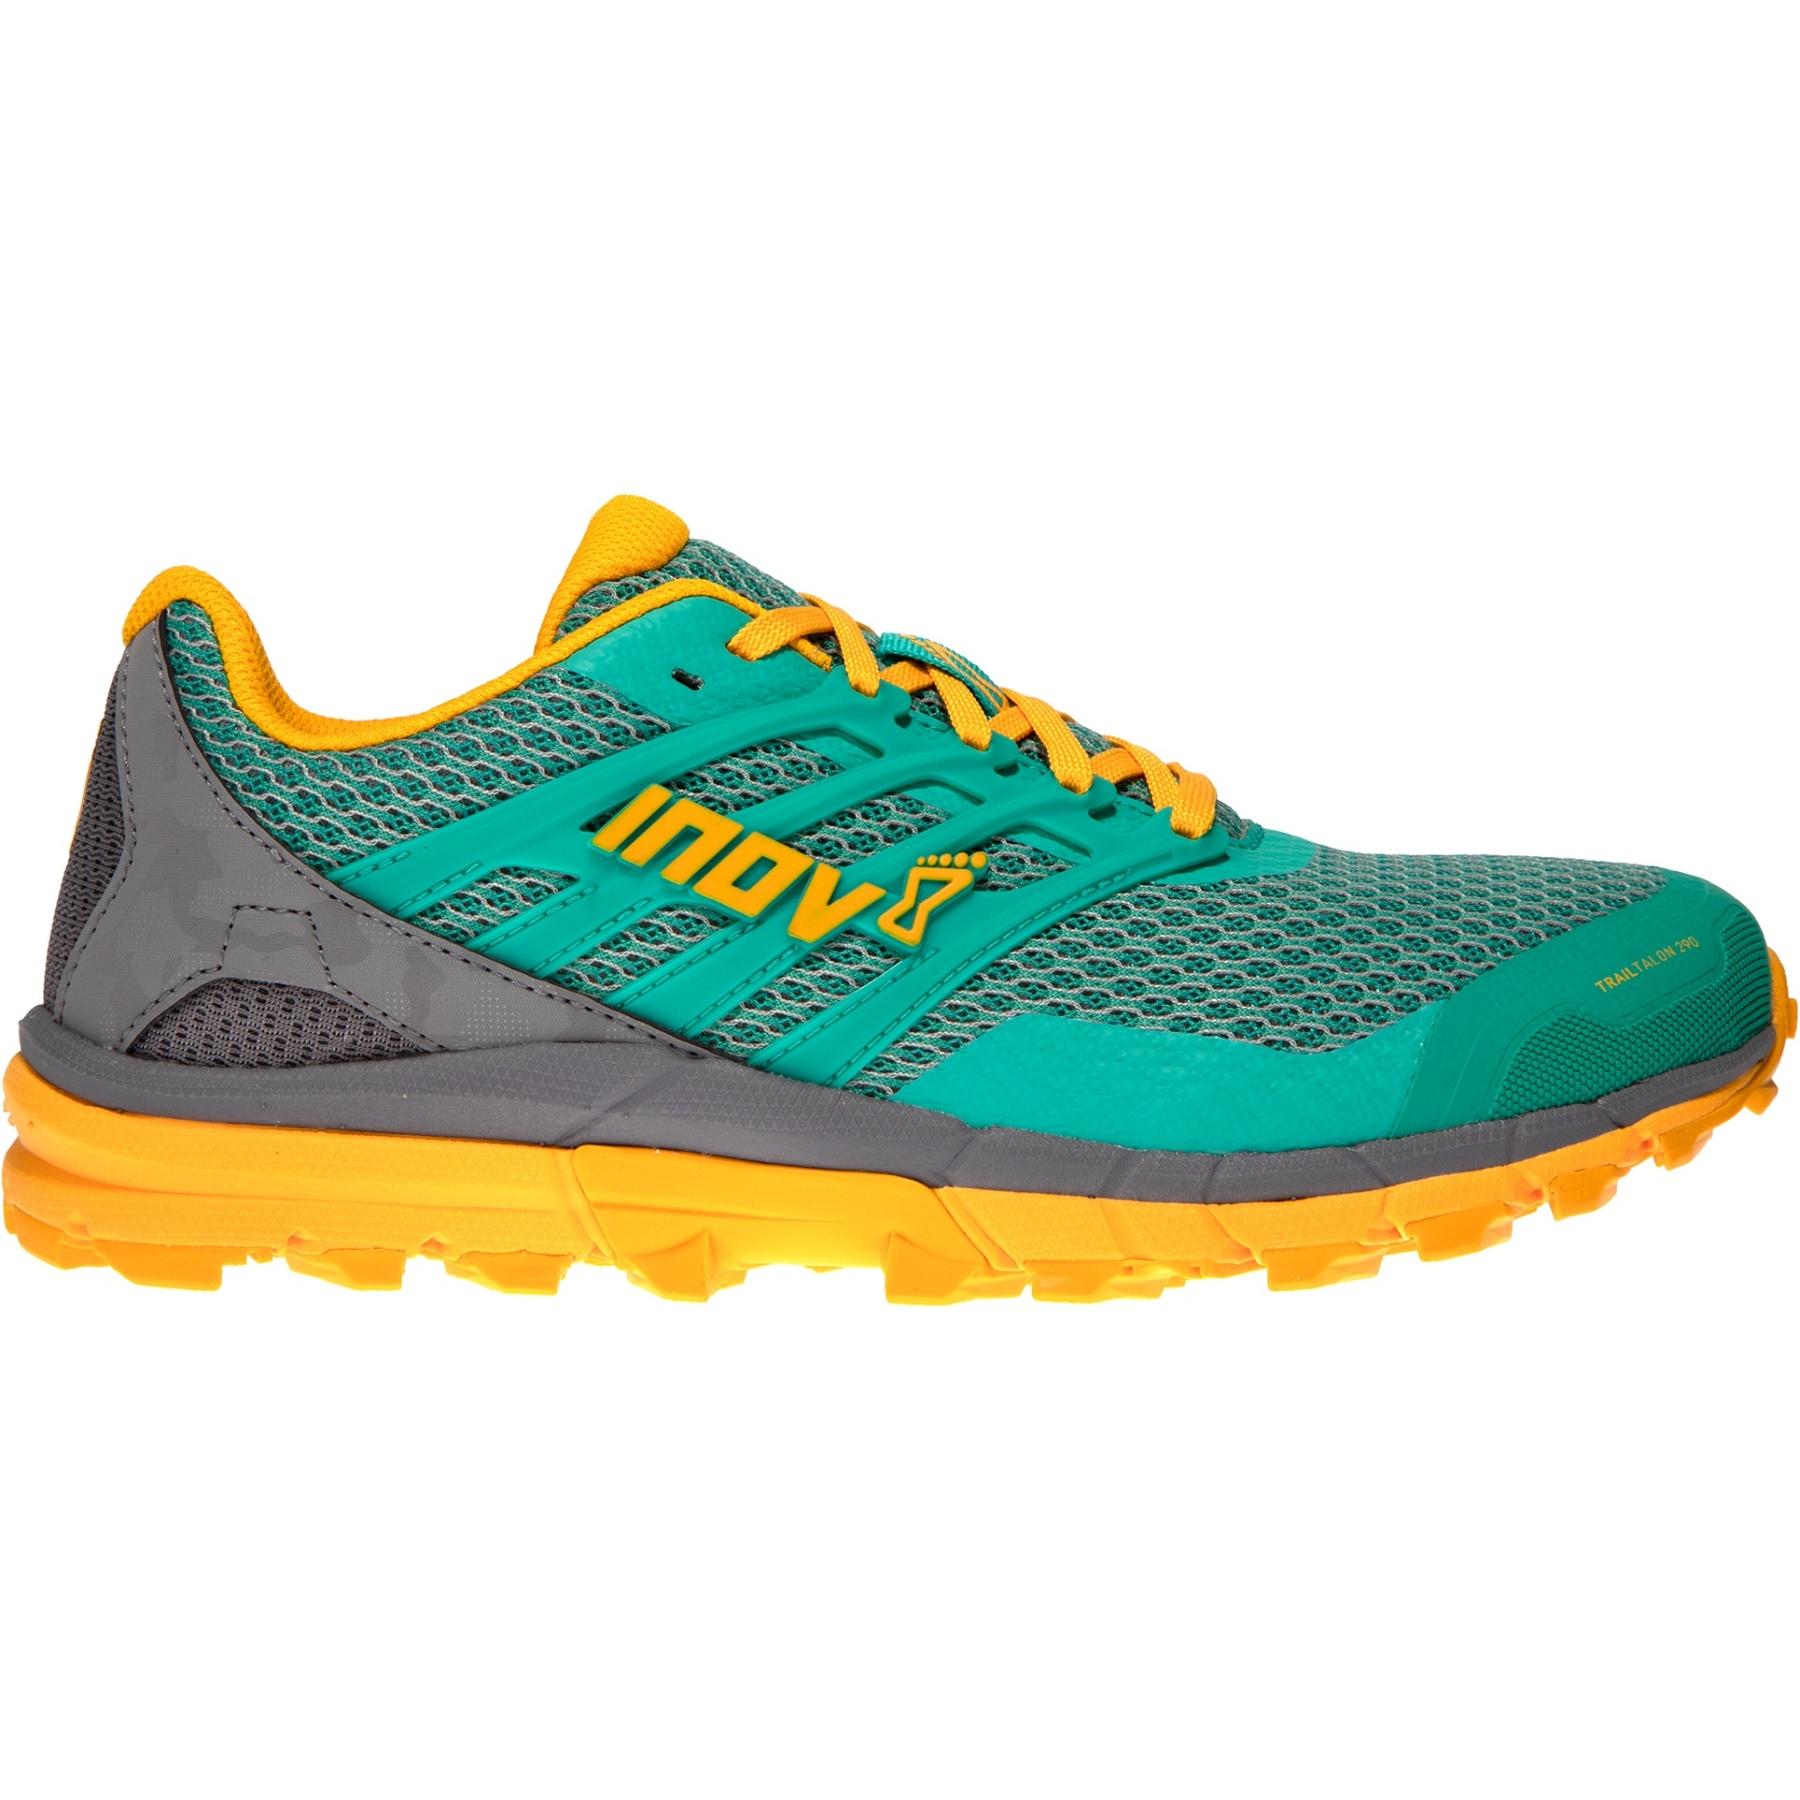 Produktbild von Inov-8 Trailtalon™ 290 V2 Damen Trail Laufschuhe - teal/grey/yellow